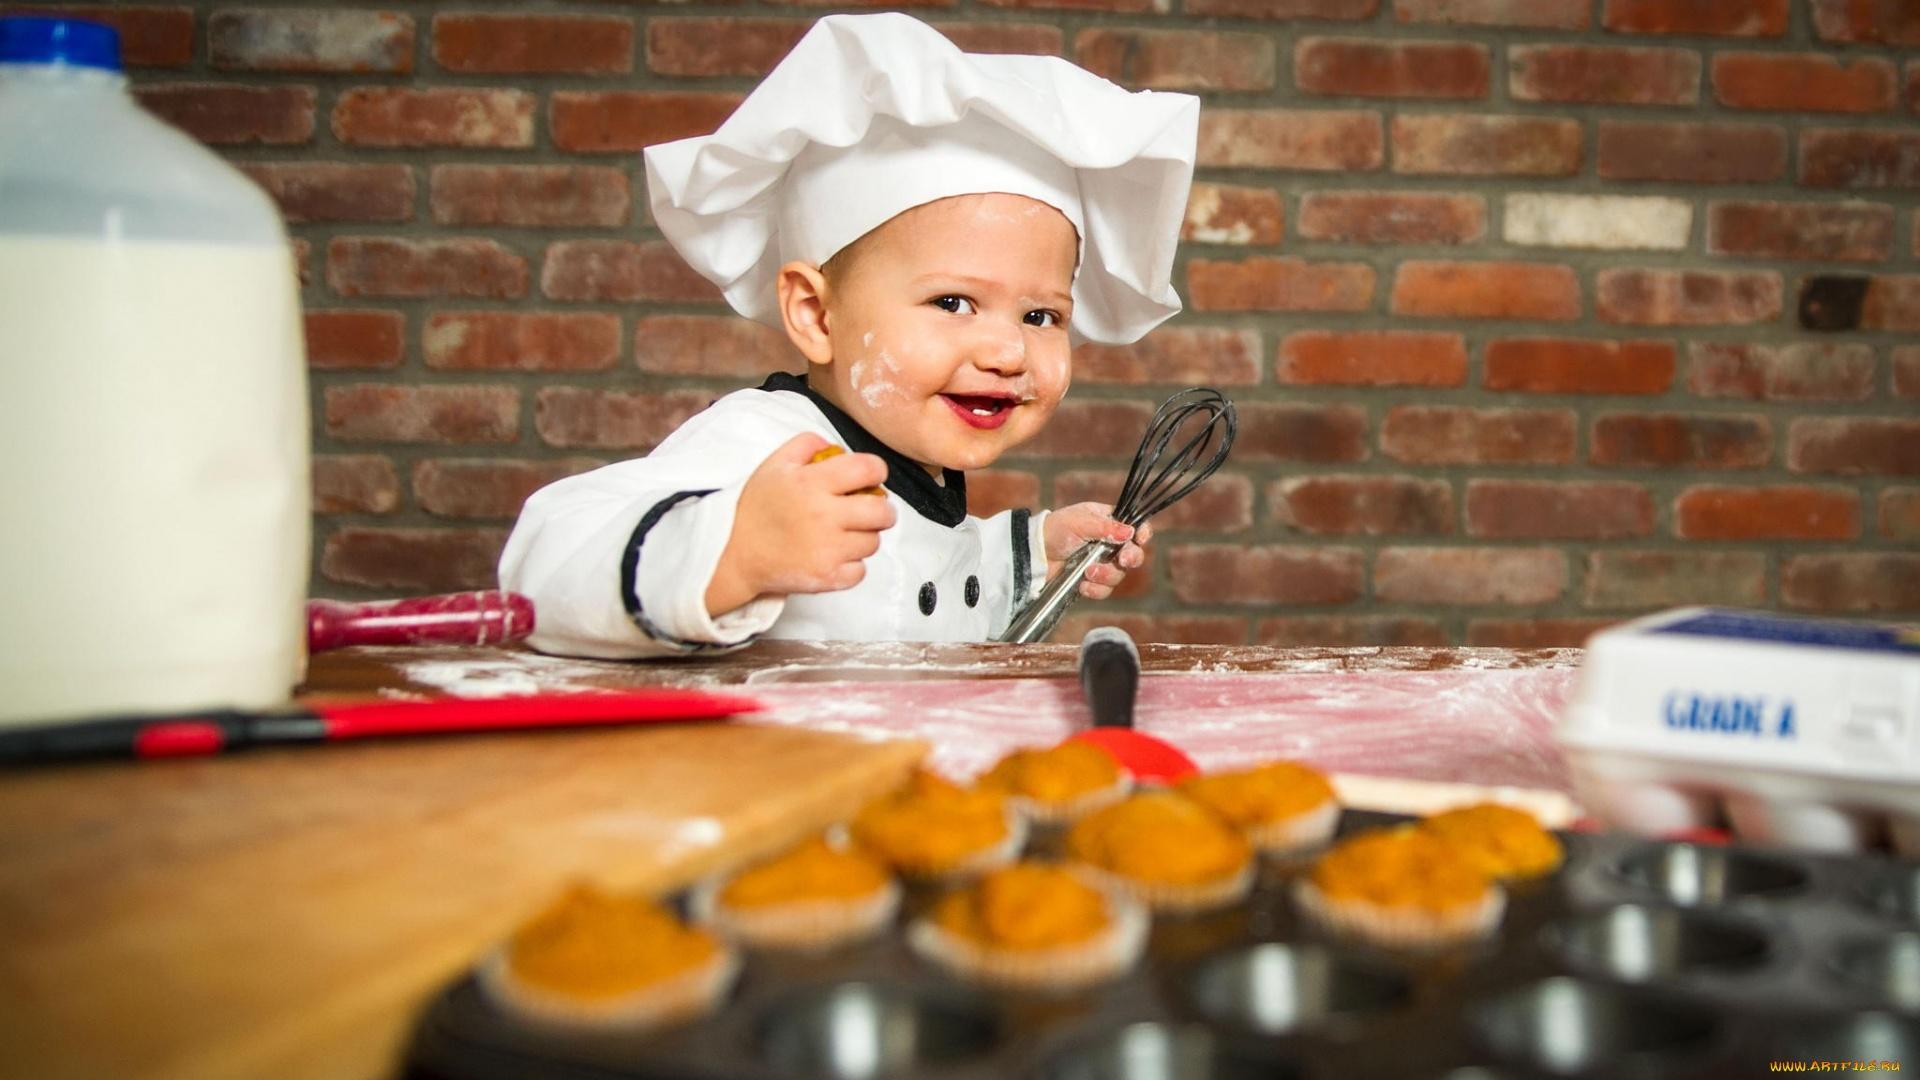 Смешные картинки ребенок повар